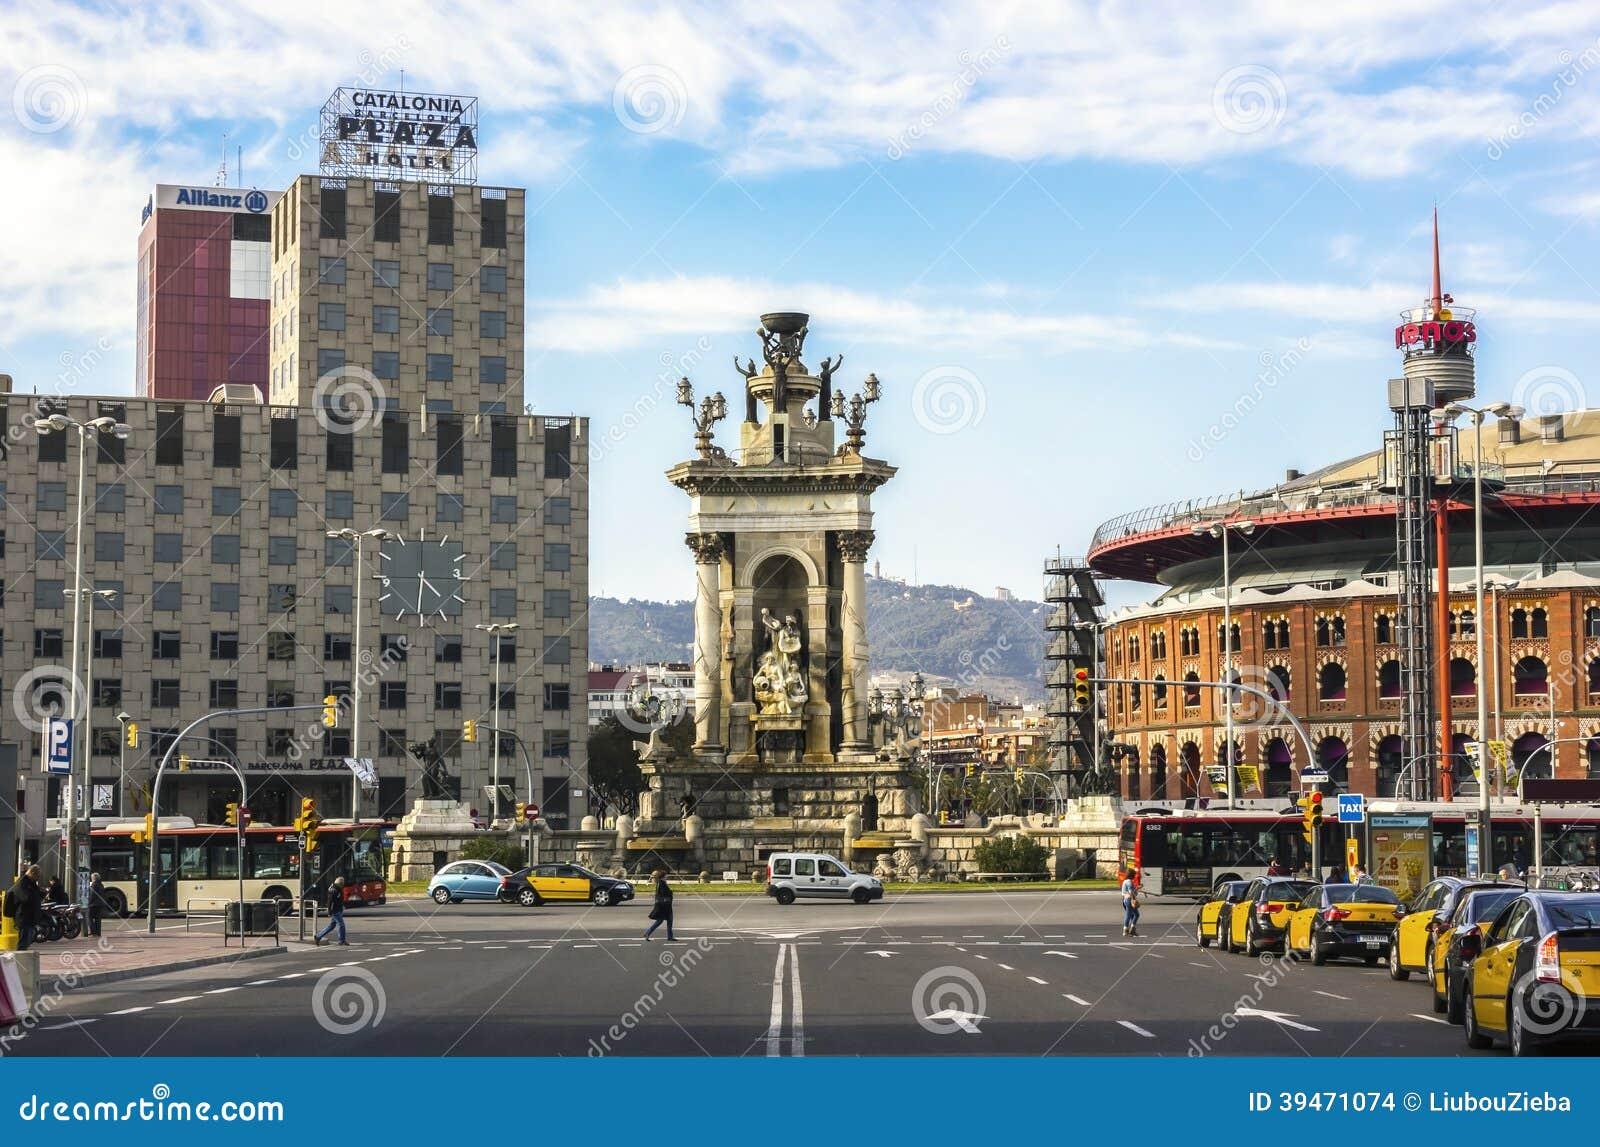 Fountain at Plaza de Espana, Barcelona